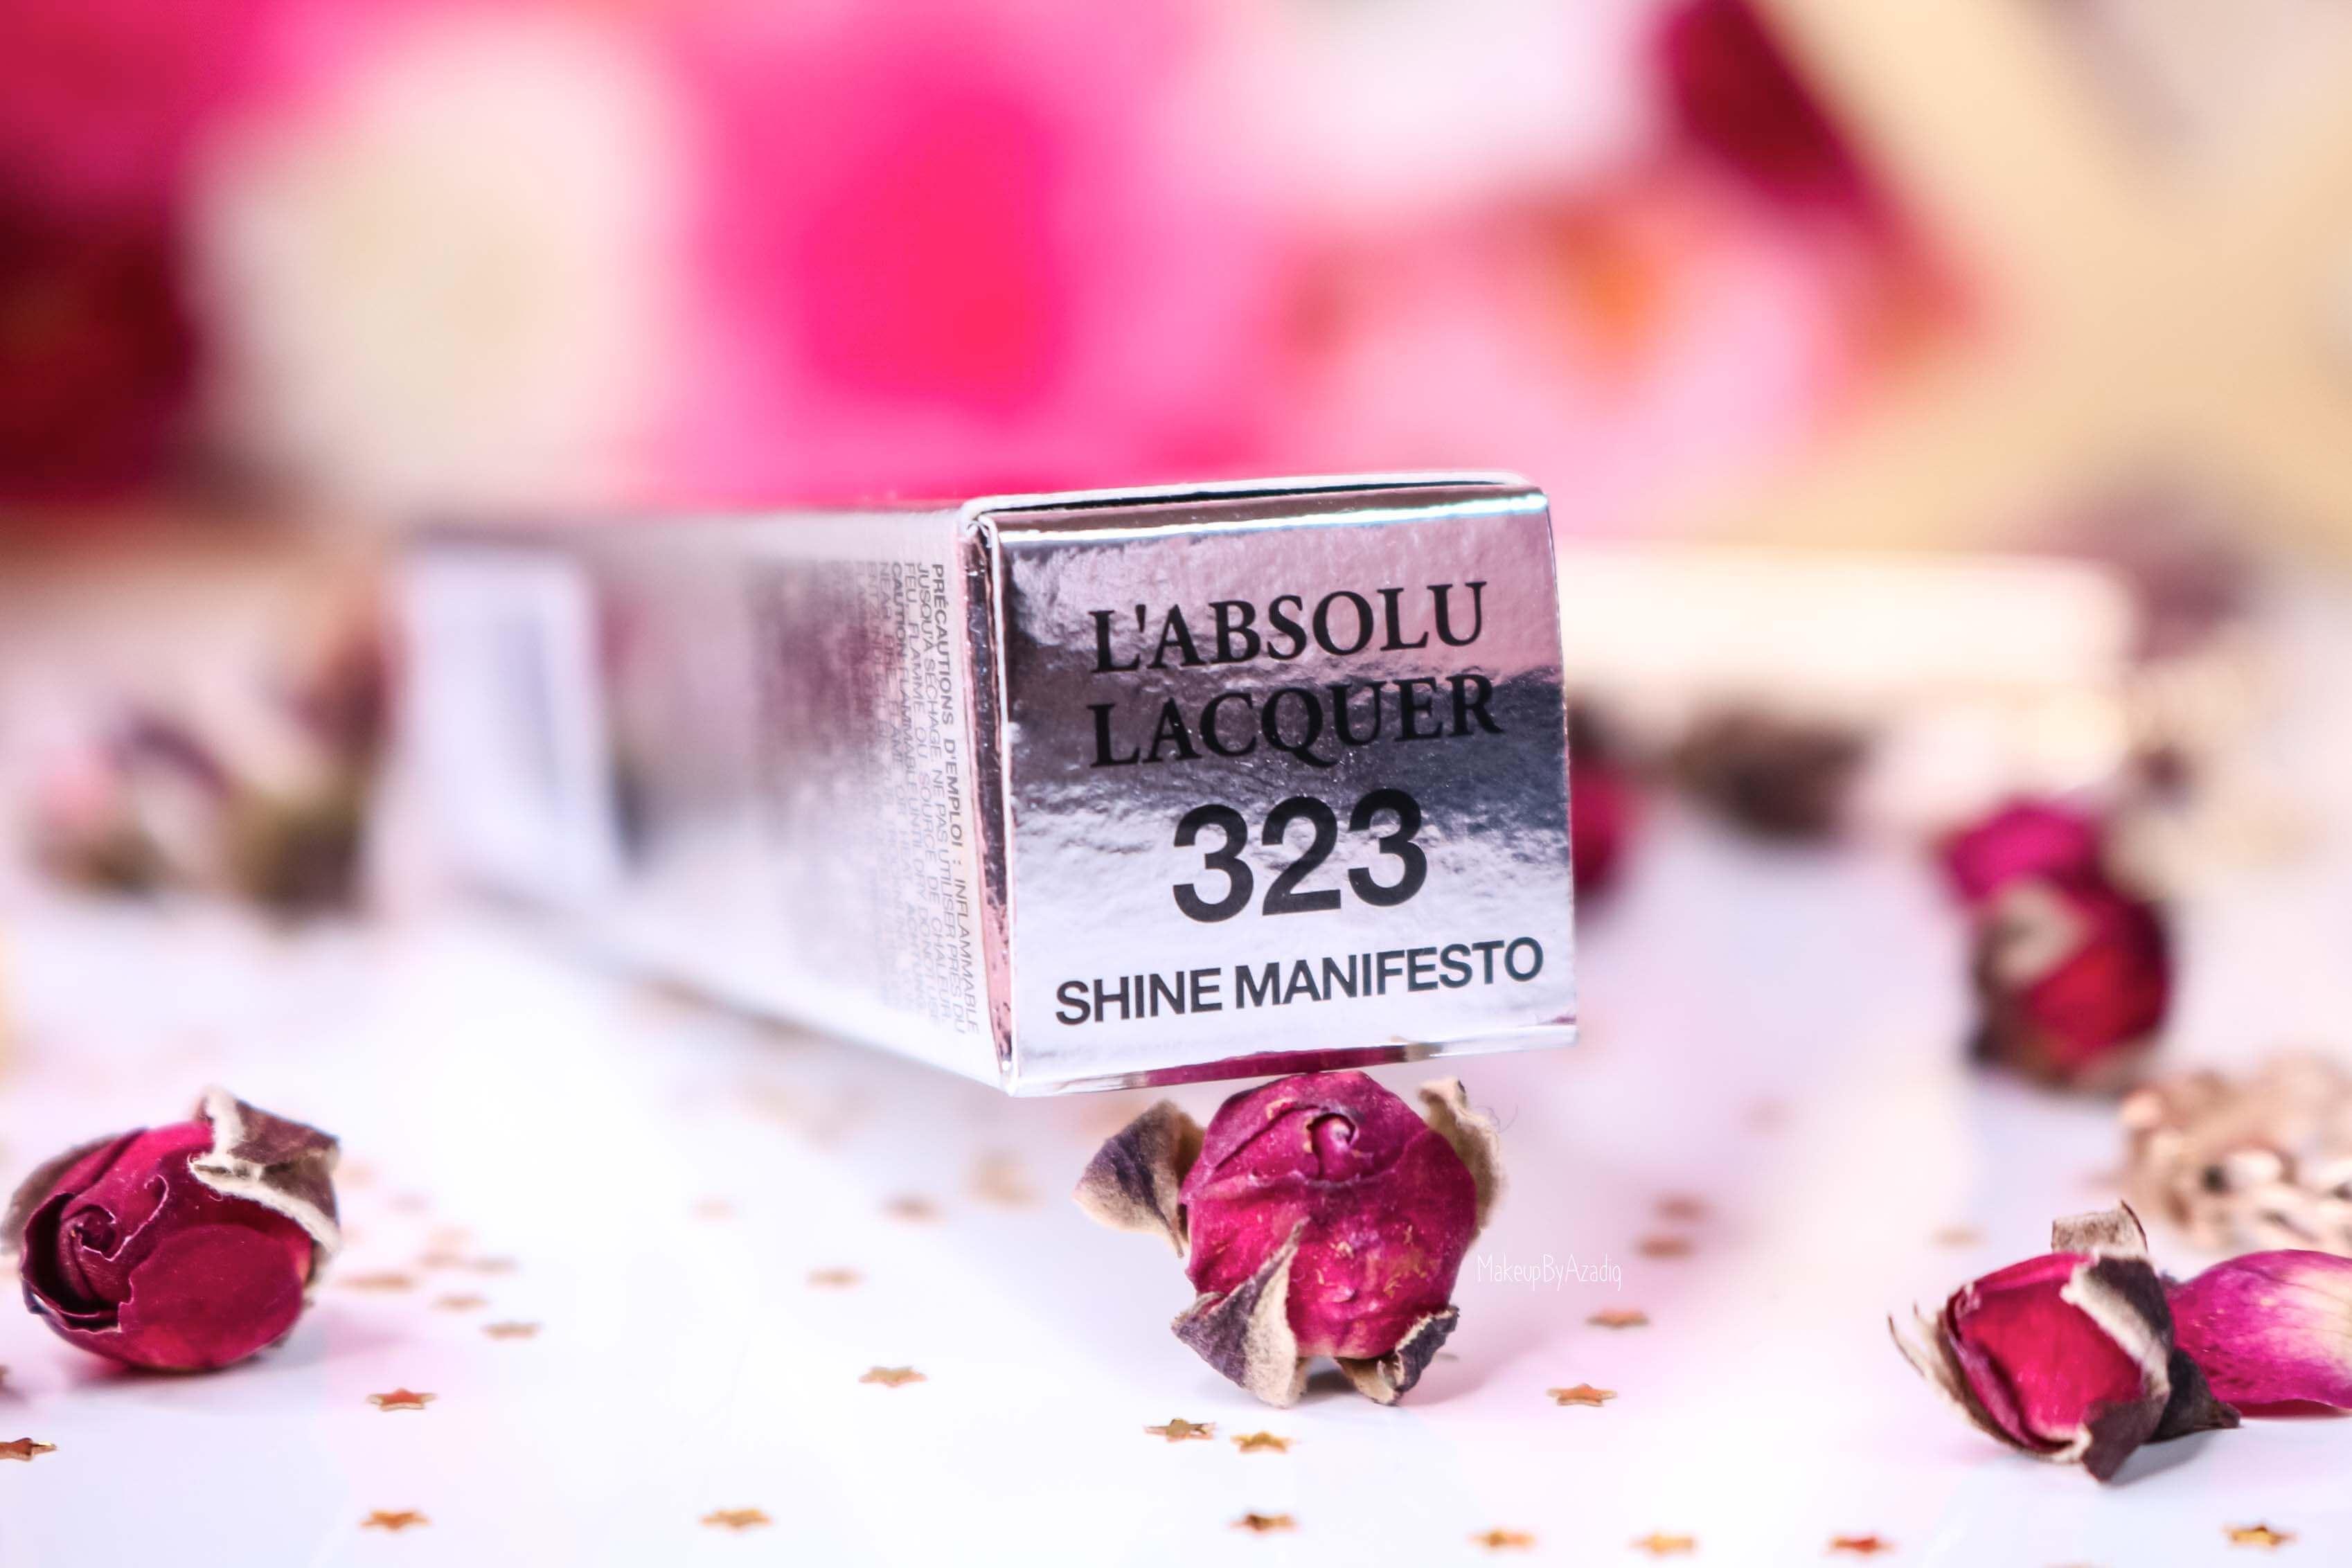 revue-lacque-a-levres-absolu-lacquer-lancome-shine-manifesto-323-sephora-avis-prix-tenue-makeupbyazadig-swatch-teinte